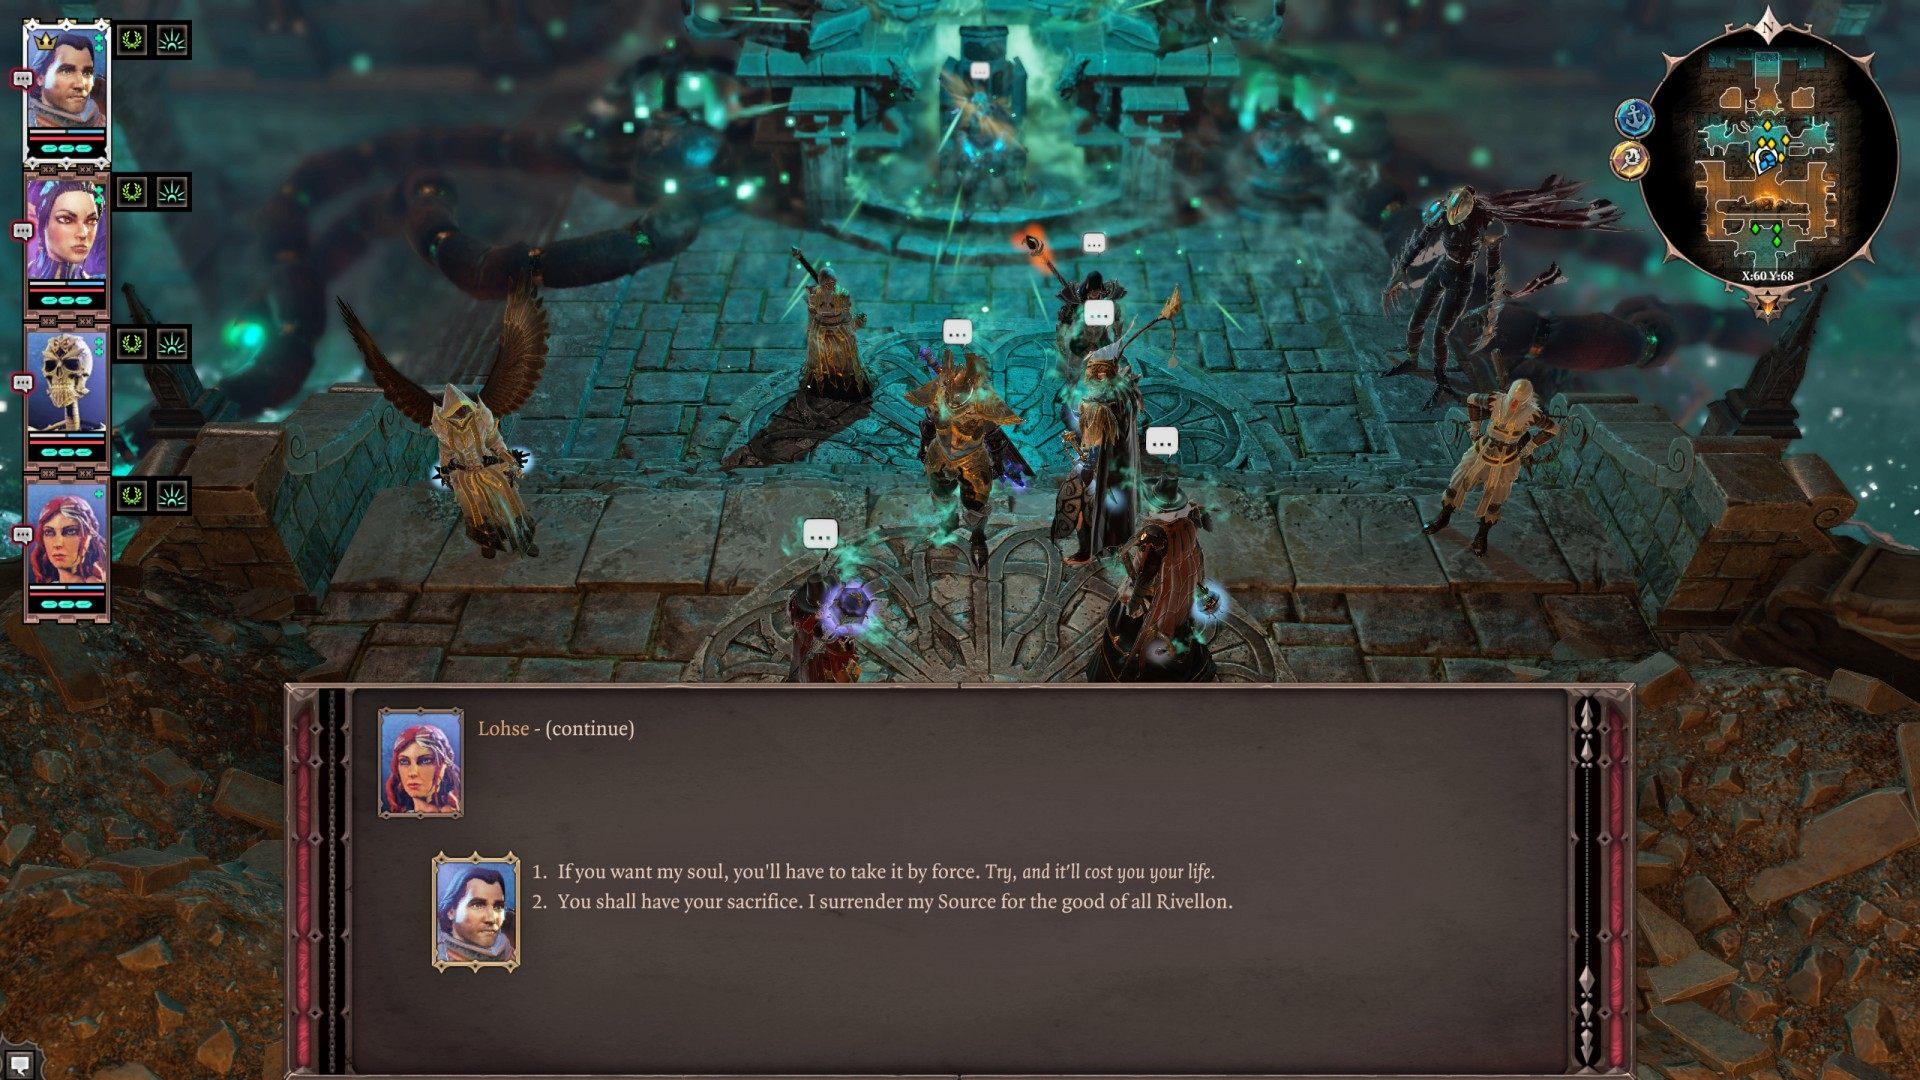 End Times, Divinity: Original Sin 2 Quest